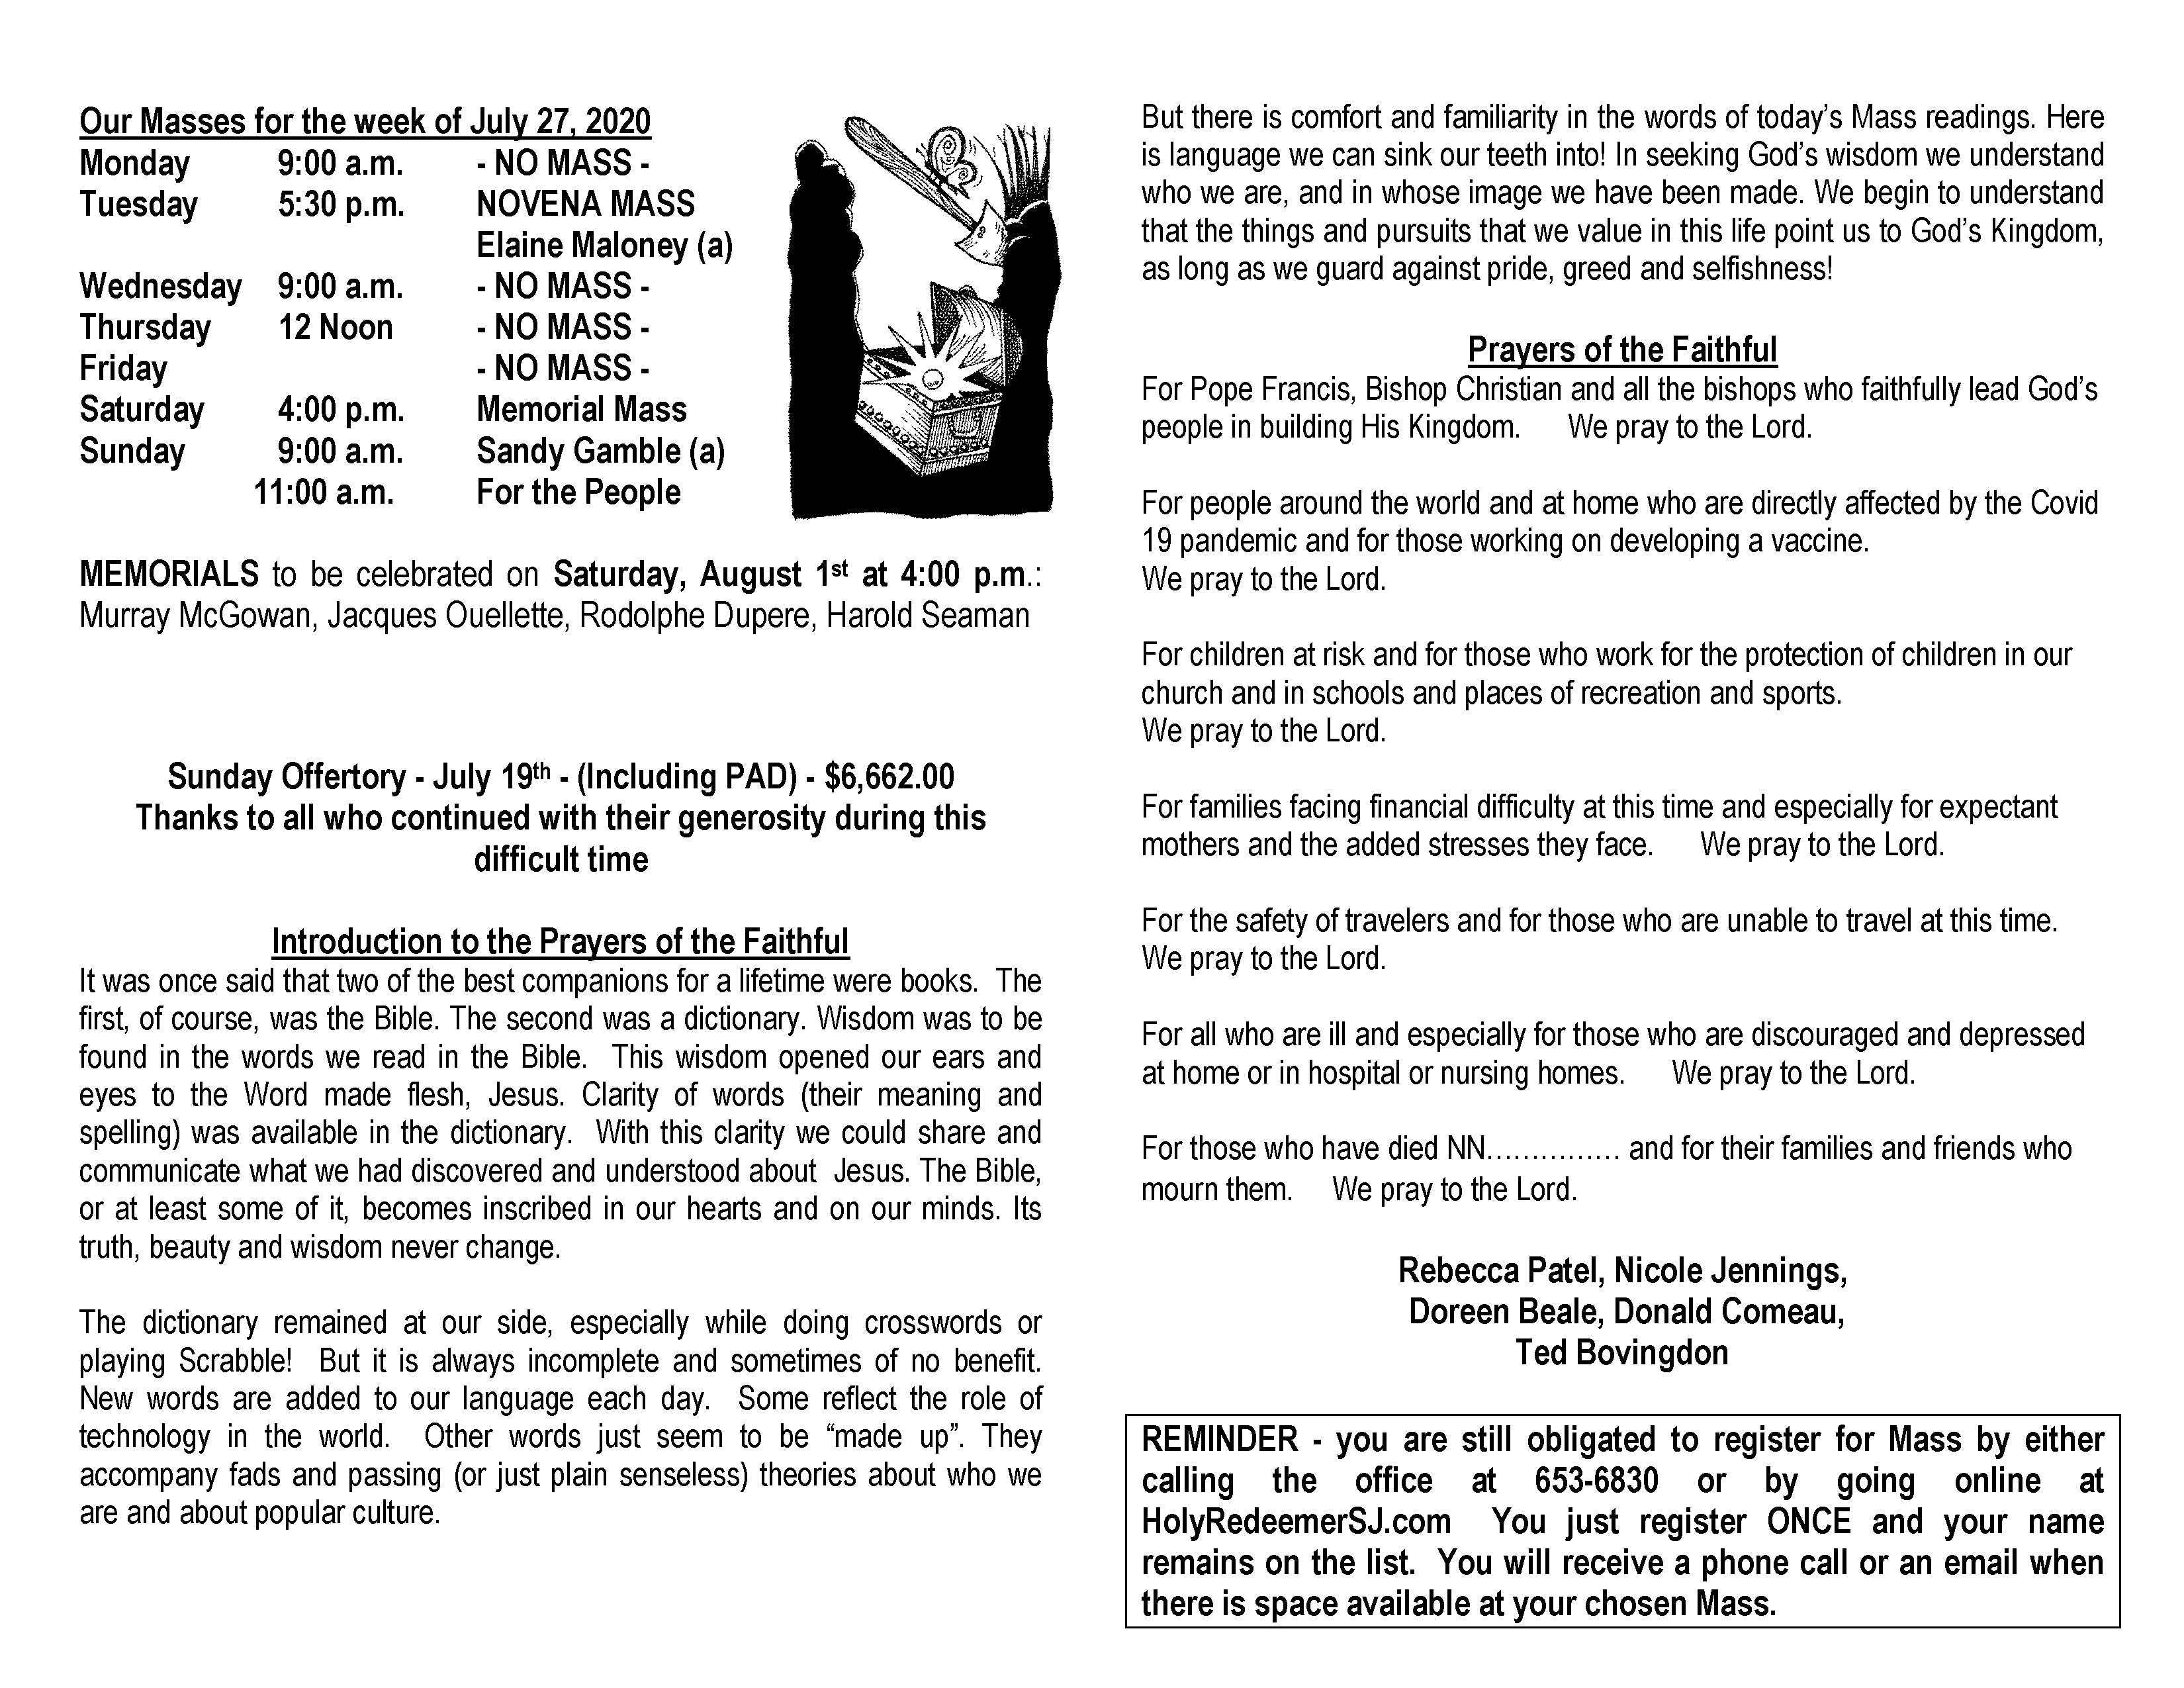 07-26-20